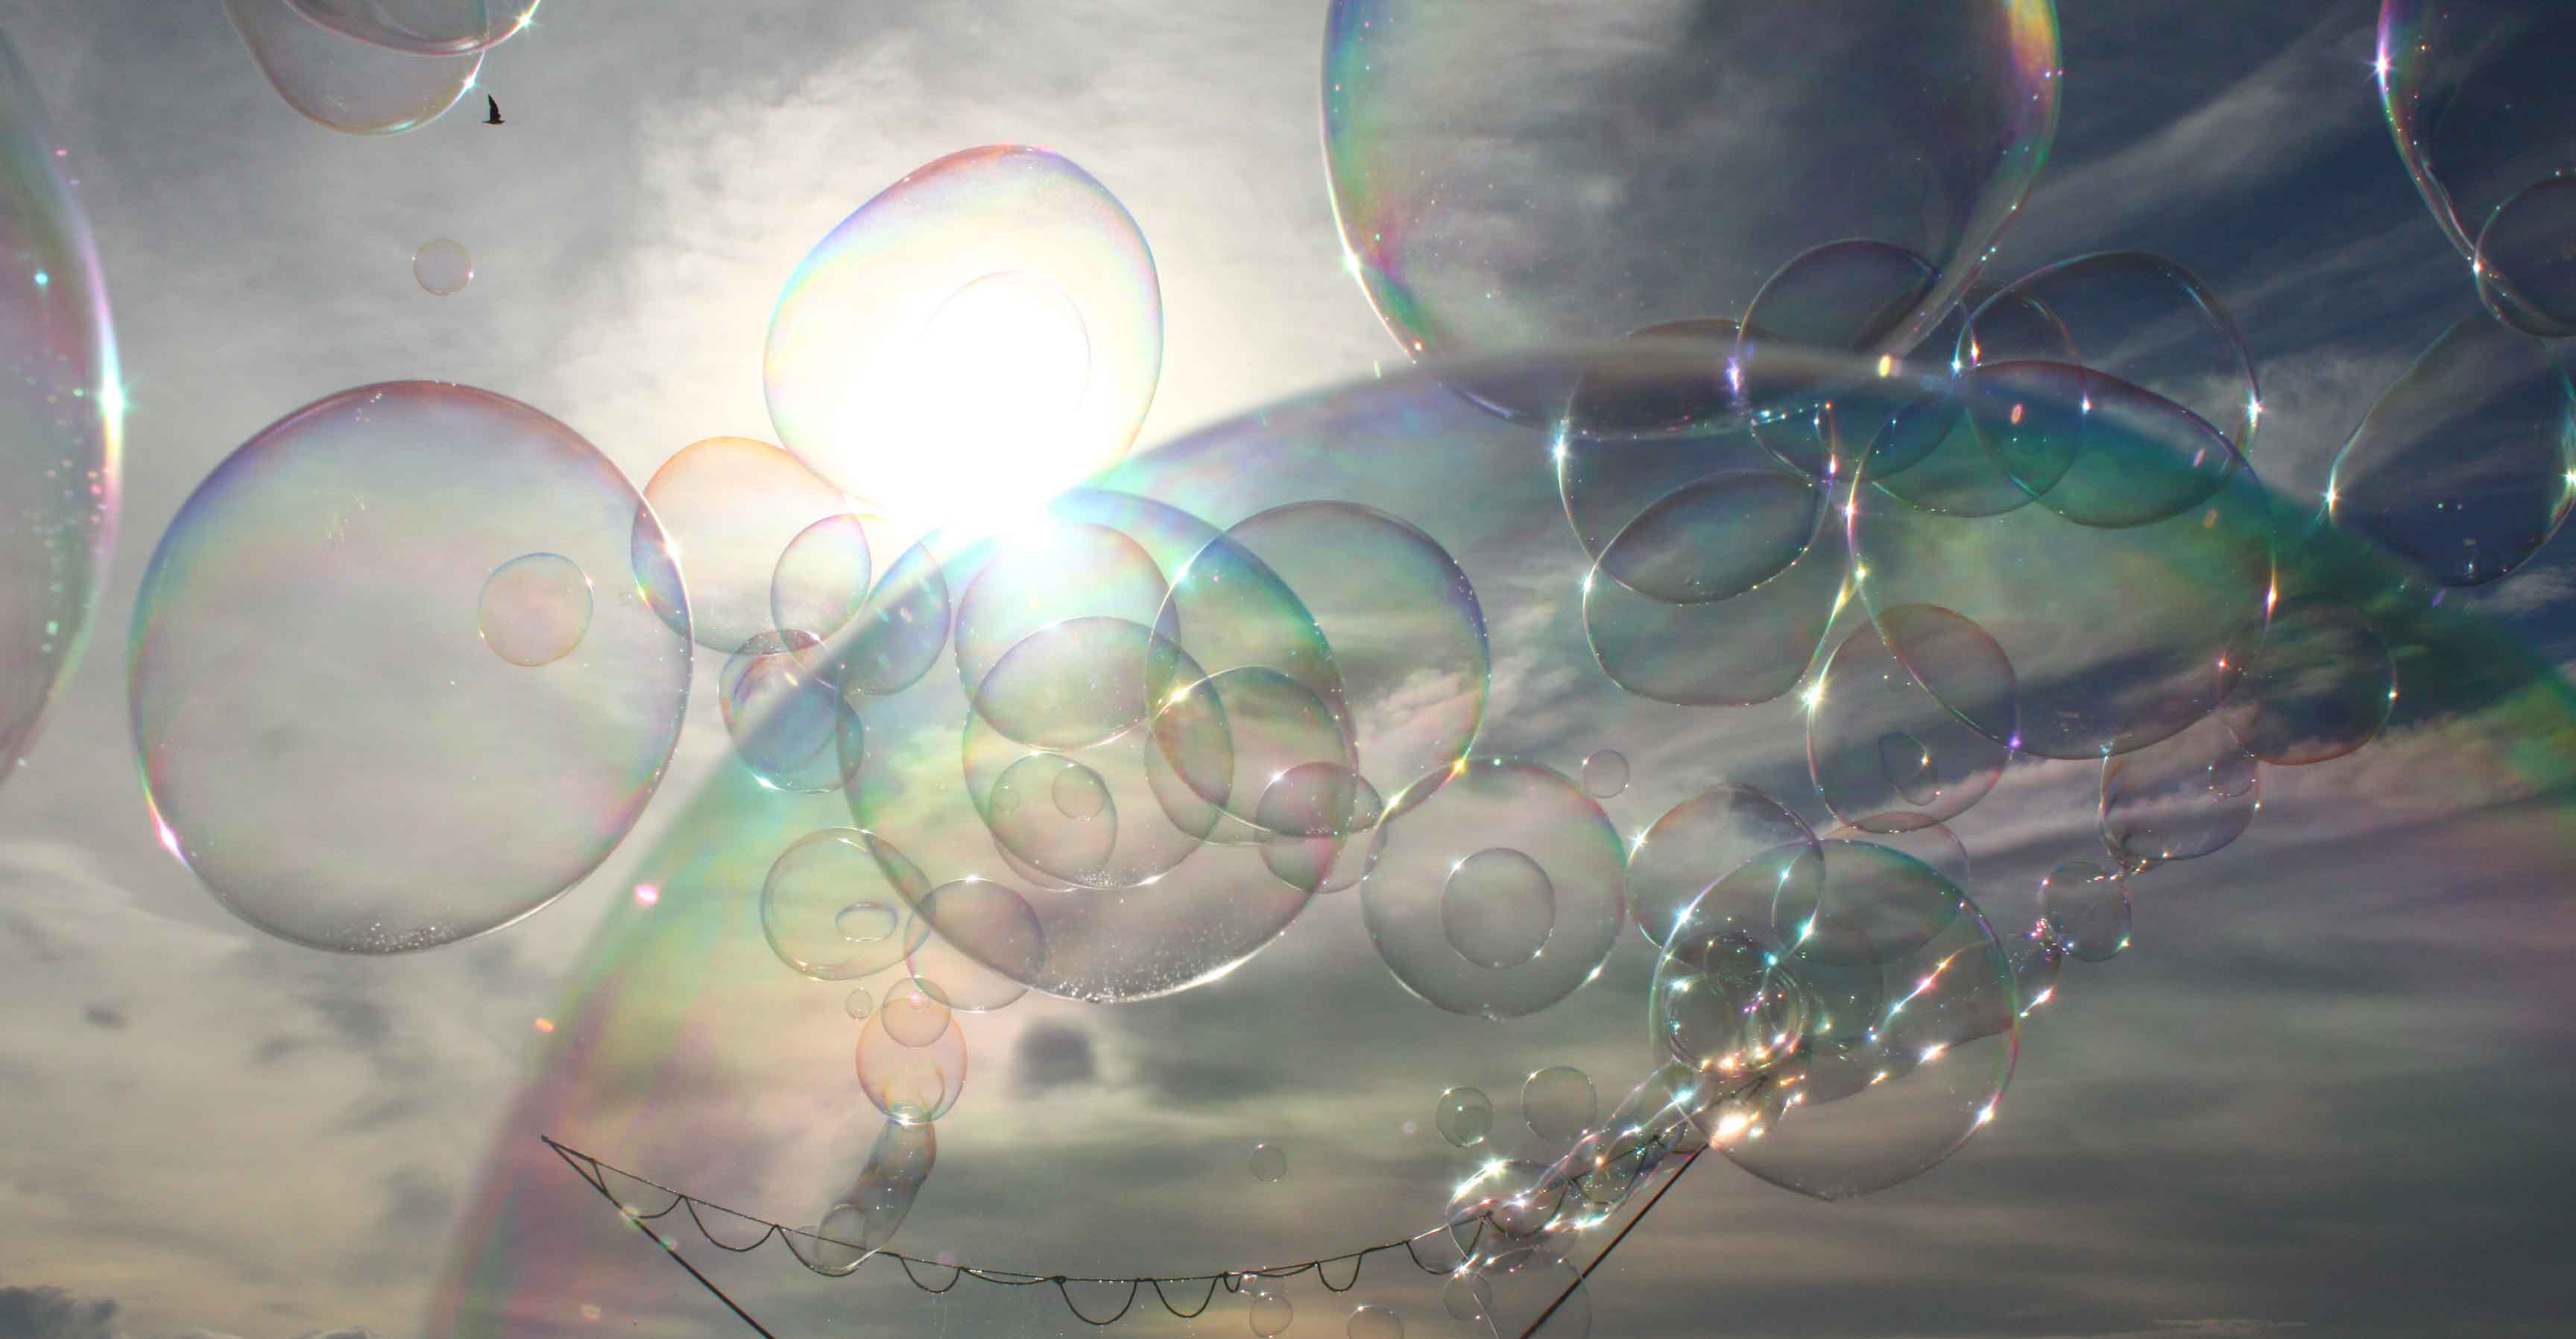 Riesenseifeblasen Girlande Seifenblasenkunst Bubblebo Seifenblasenfabrik